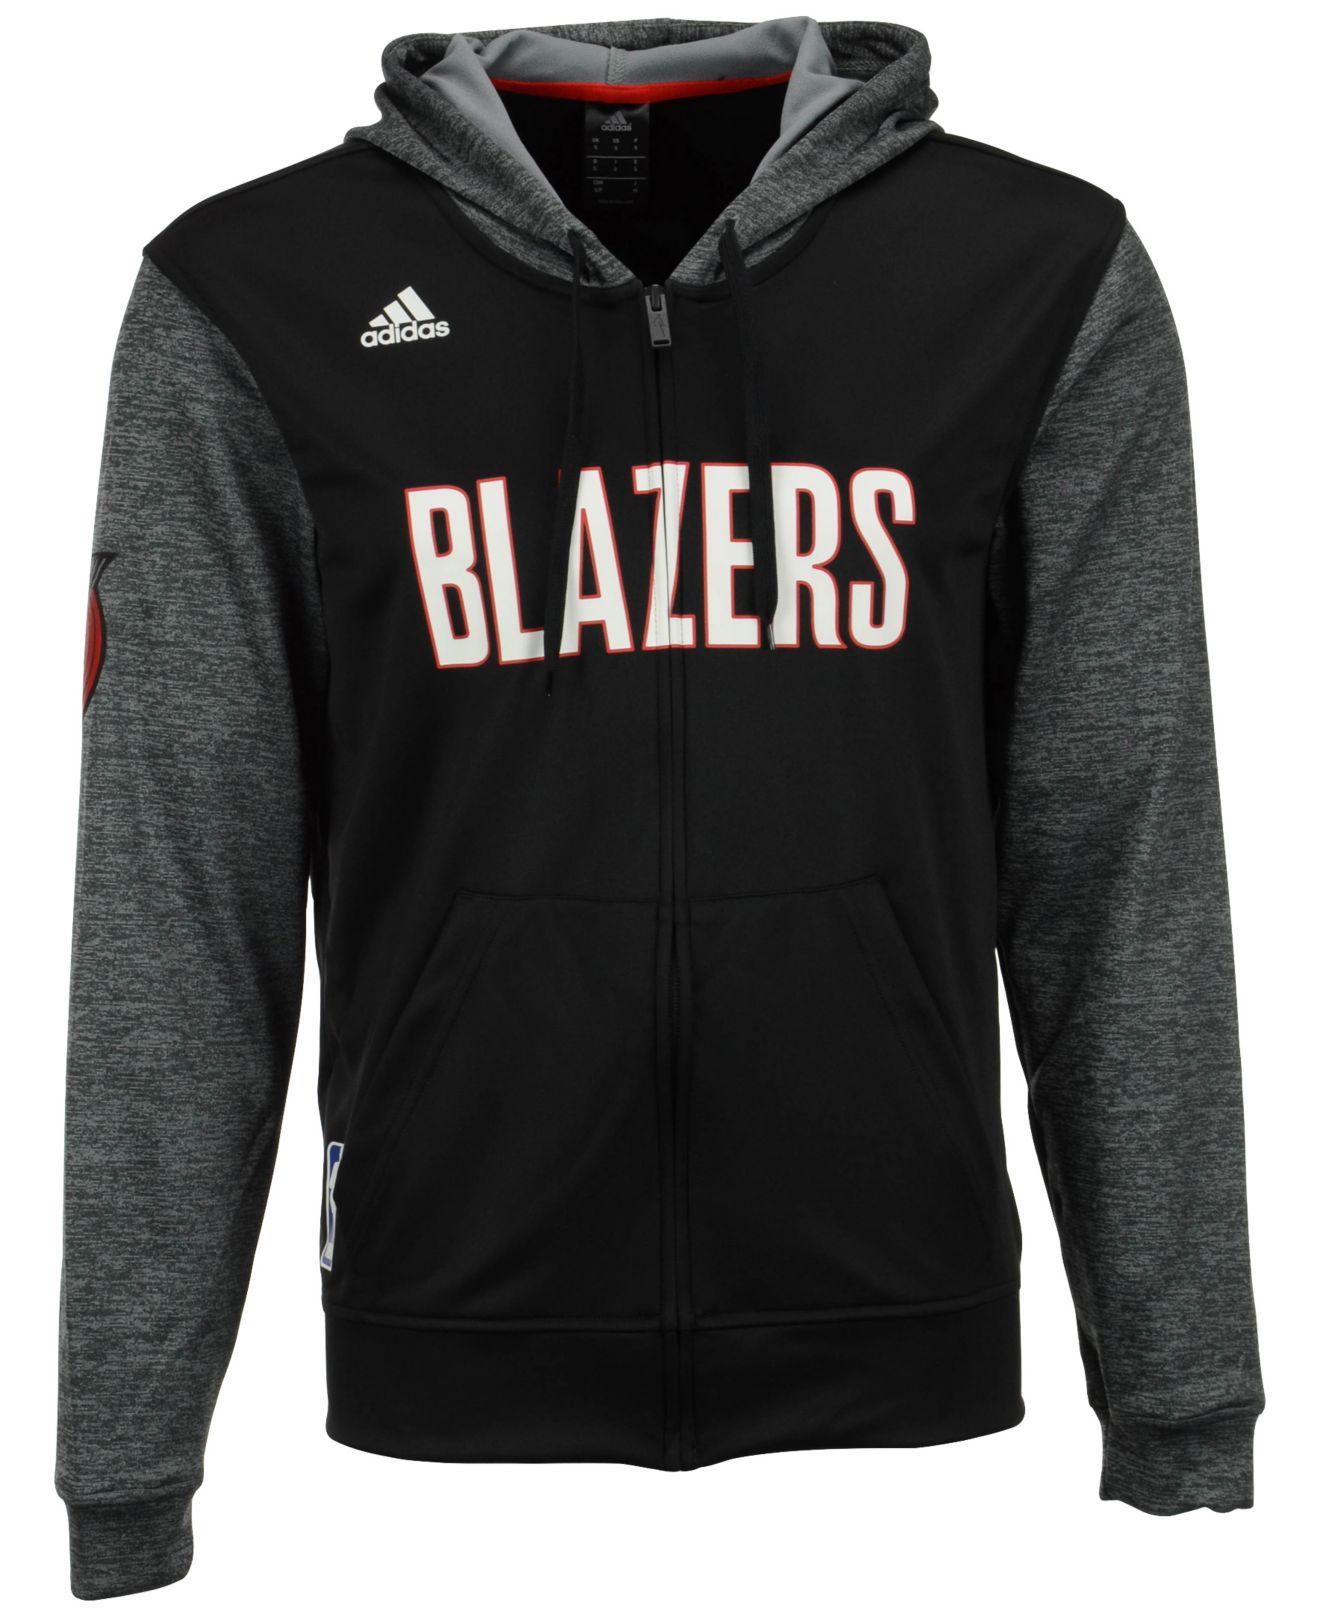 Portland Blazers Game: Adidas Men's Portland Trail Blazers Pre Game Full